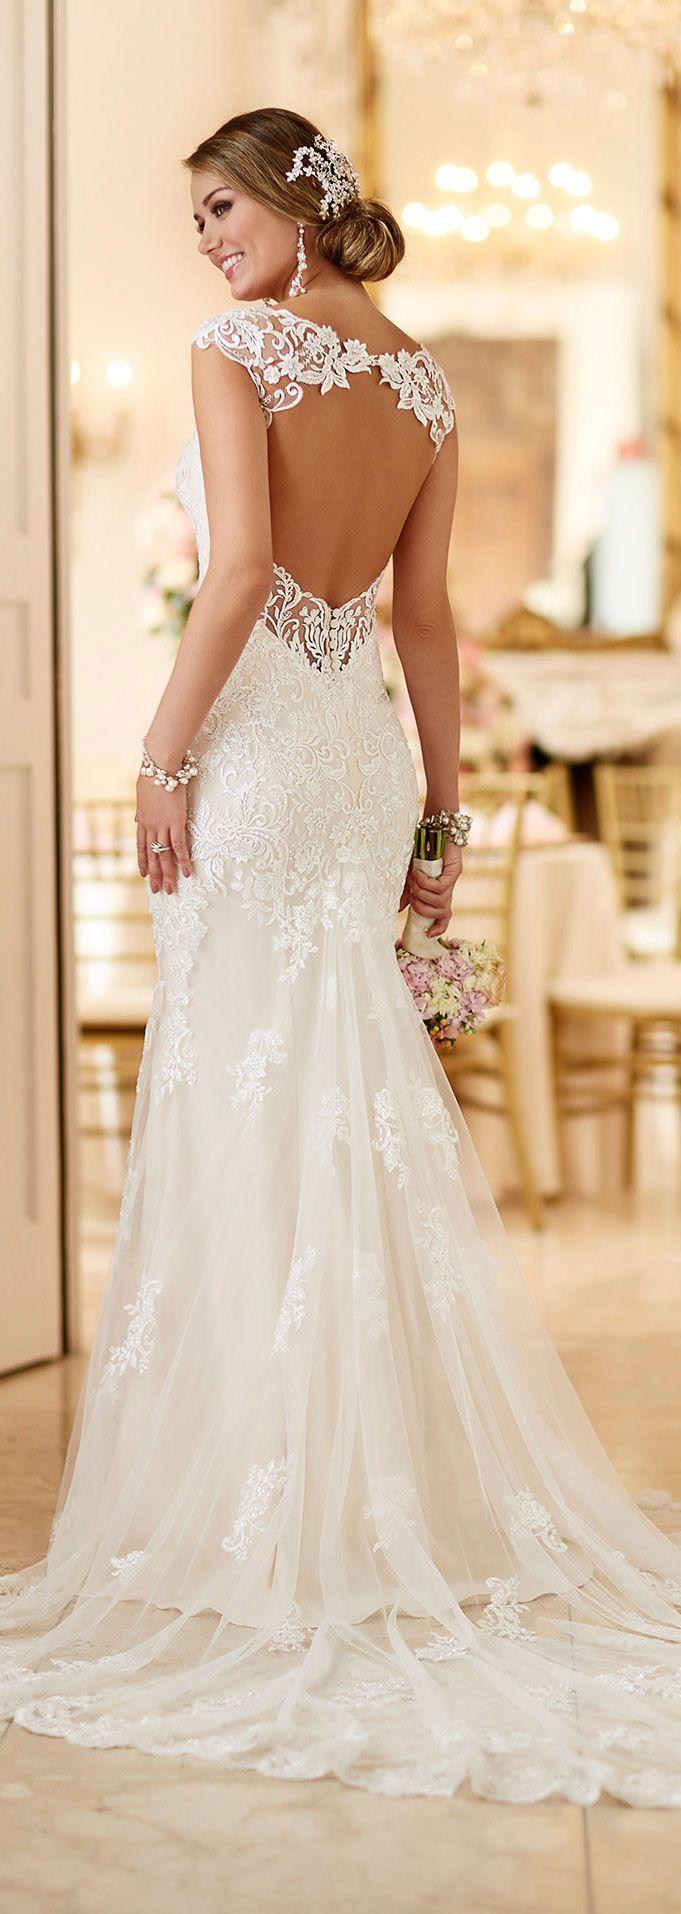 Stella York open back lace wedding dresses | Wedding Inspiration ...